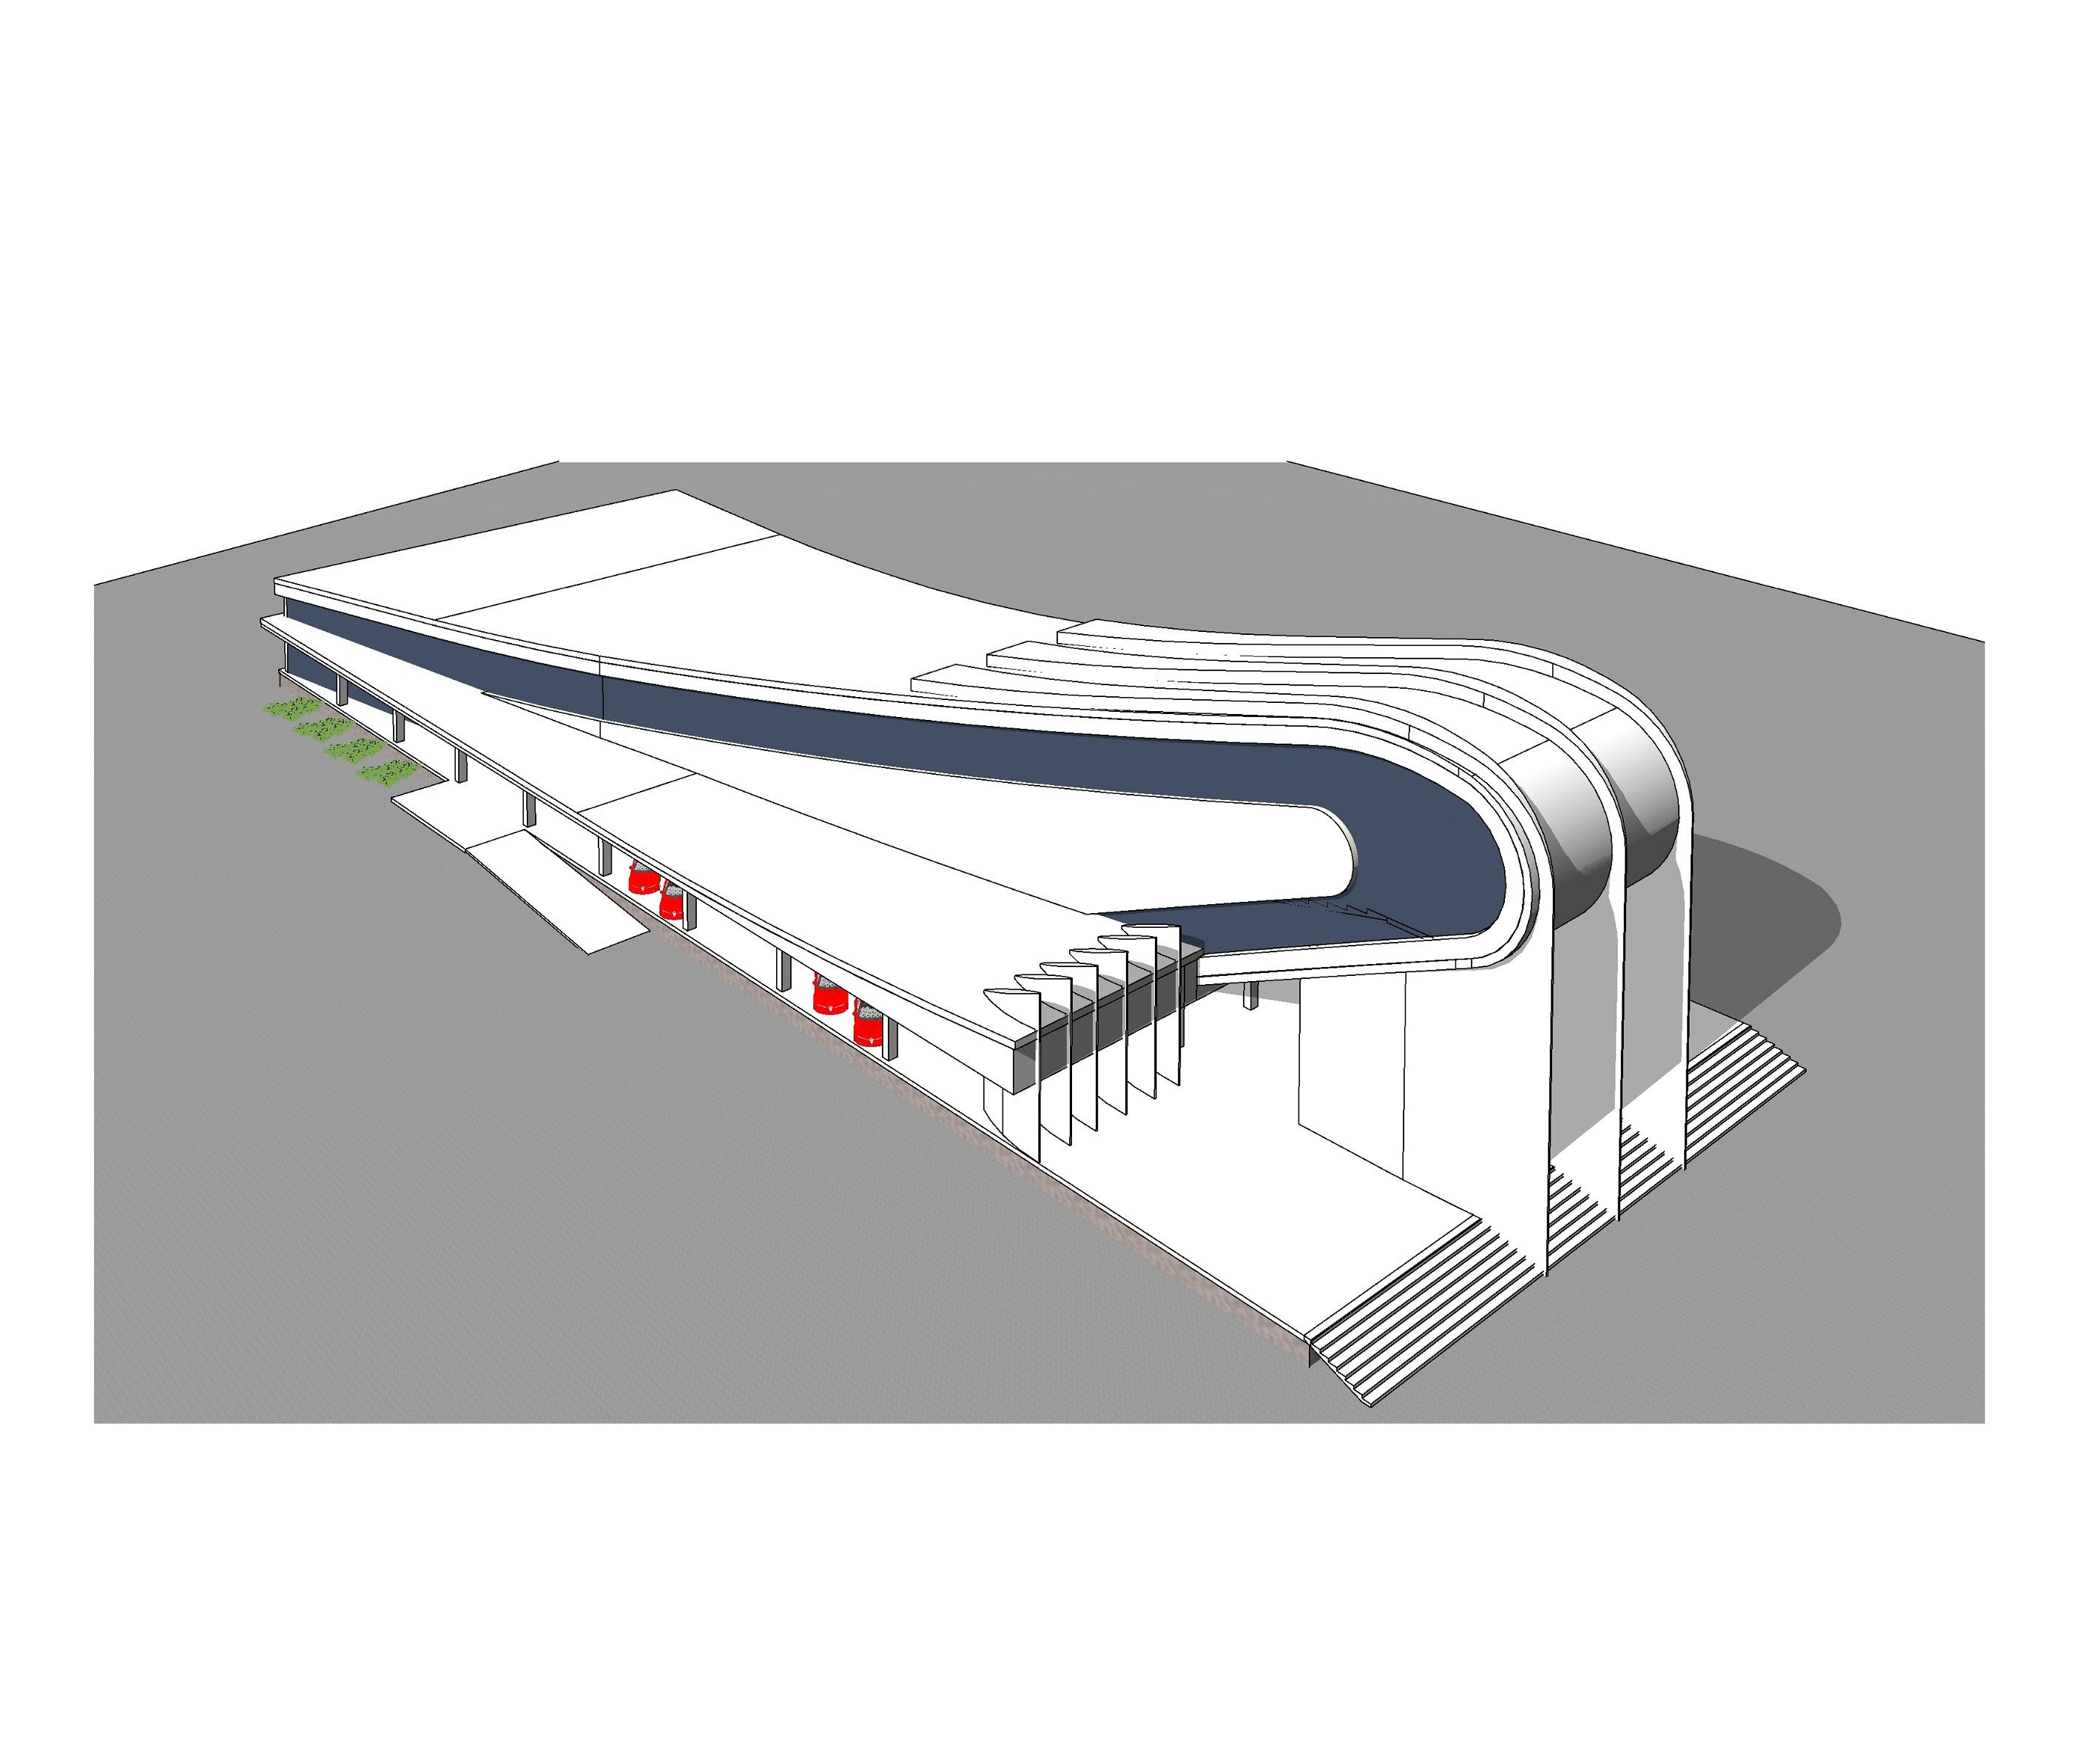 Разработка архитектурной концепции театра оперы и балета фото f_85652f574cc2828d.jpg